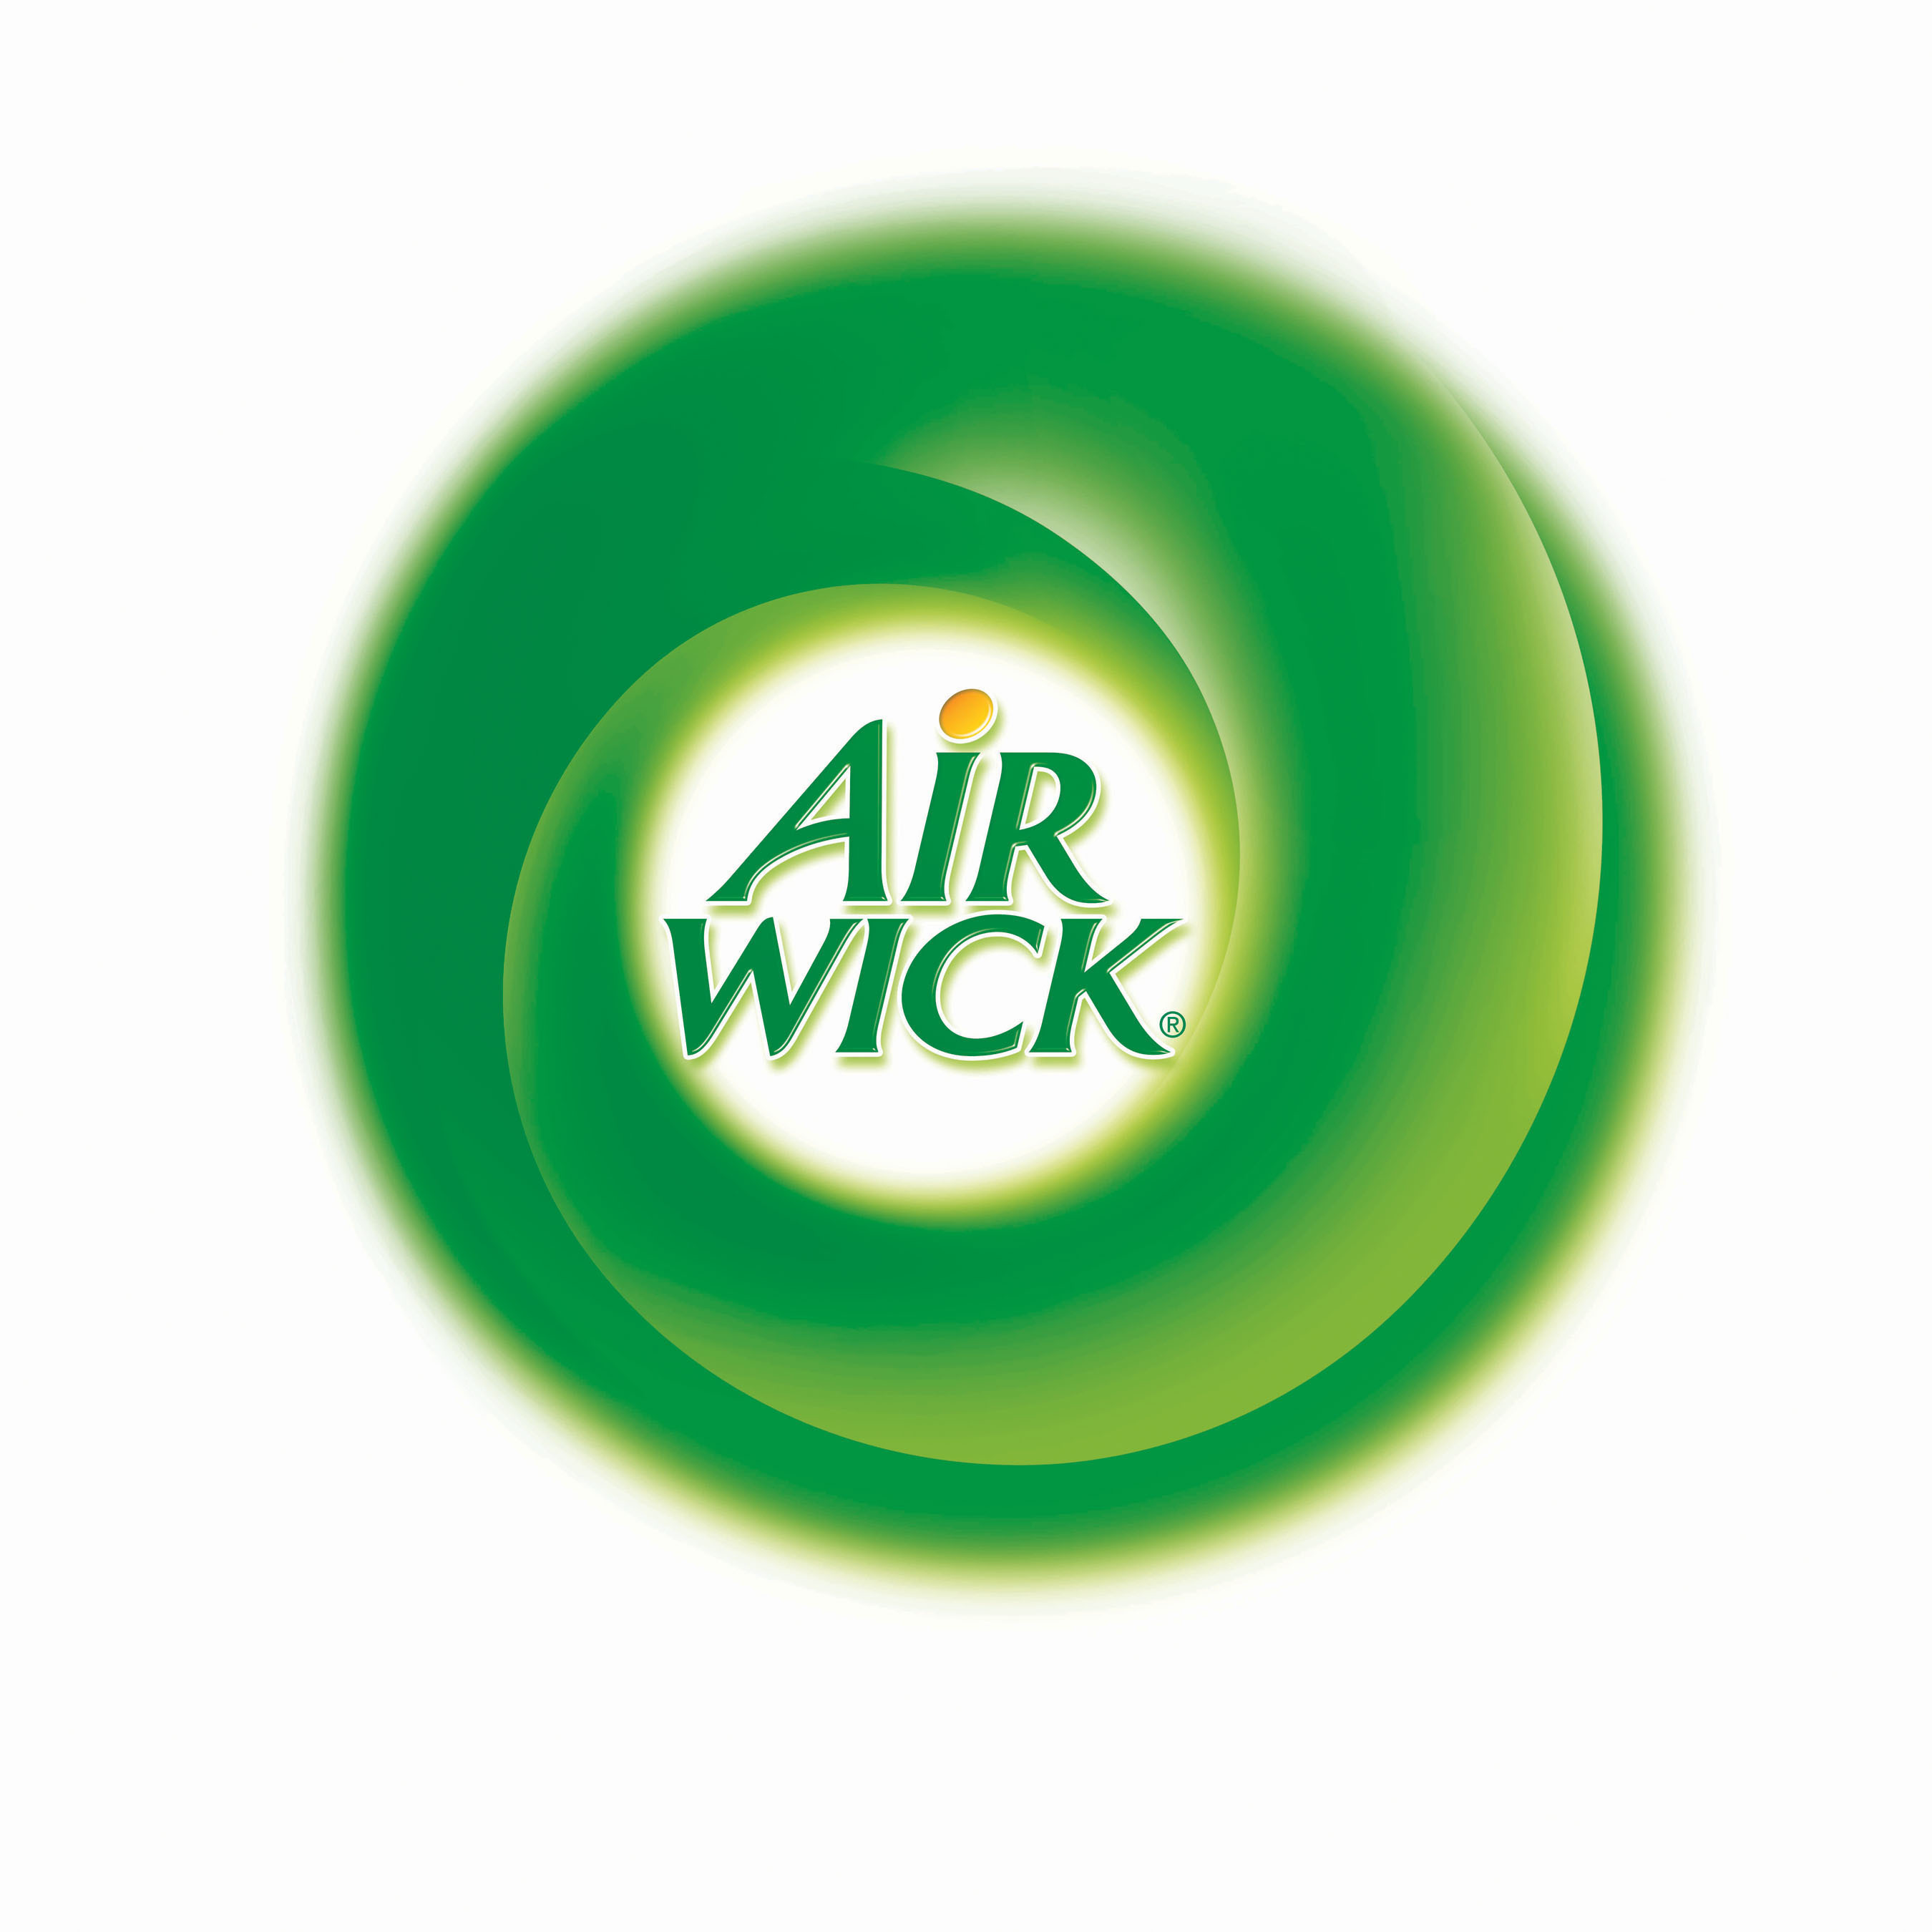 Reckitt Benckiser's Air Wick.